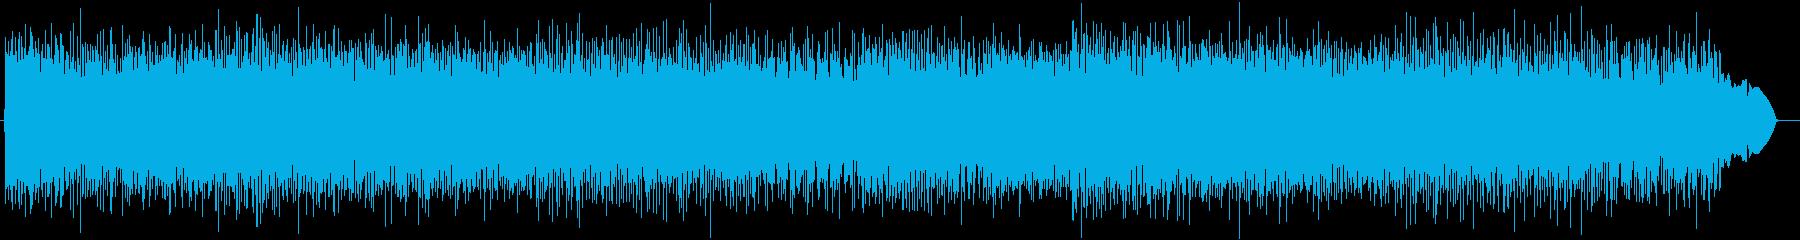 HARDROCK、激しい、BGM282の再生済みの波形